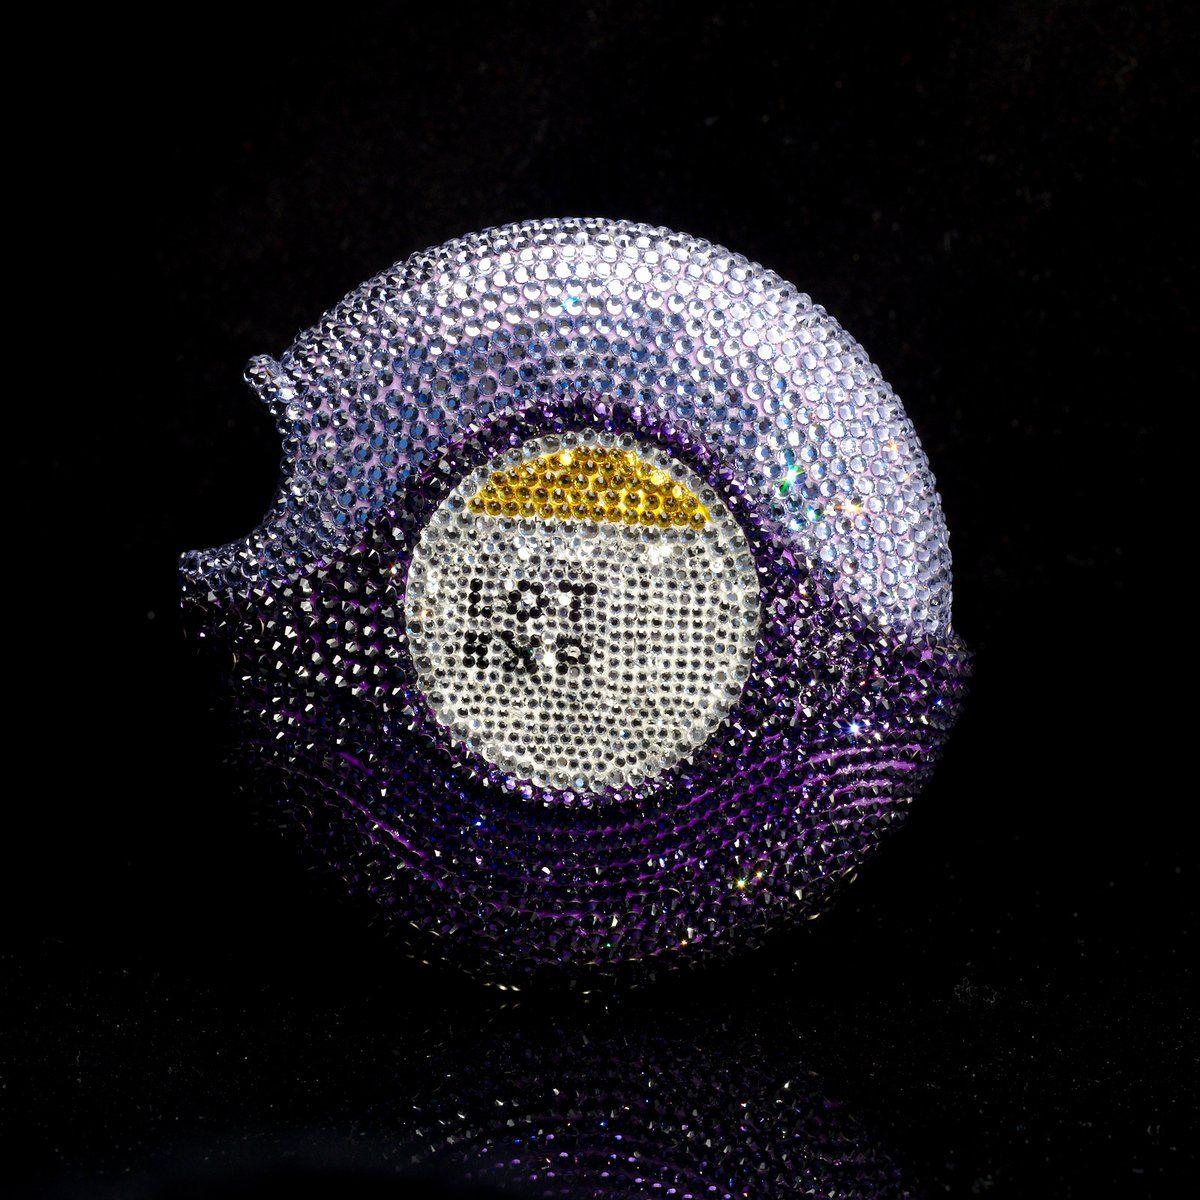 Advaiar Diskus Inhaler Judith G Klausner Sparkles Glitter Metallic Colors Glitter Pin